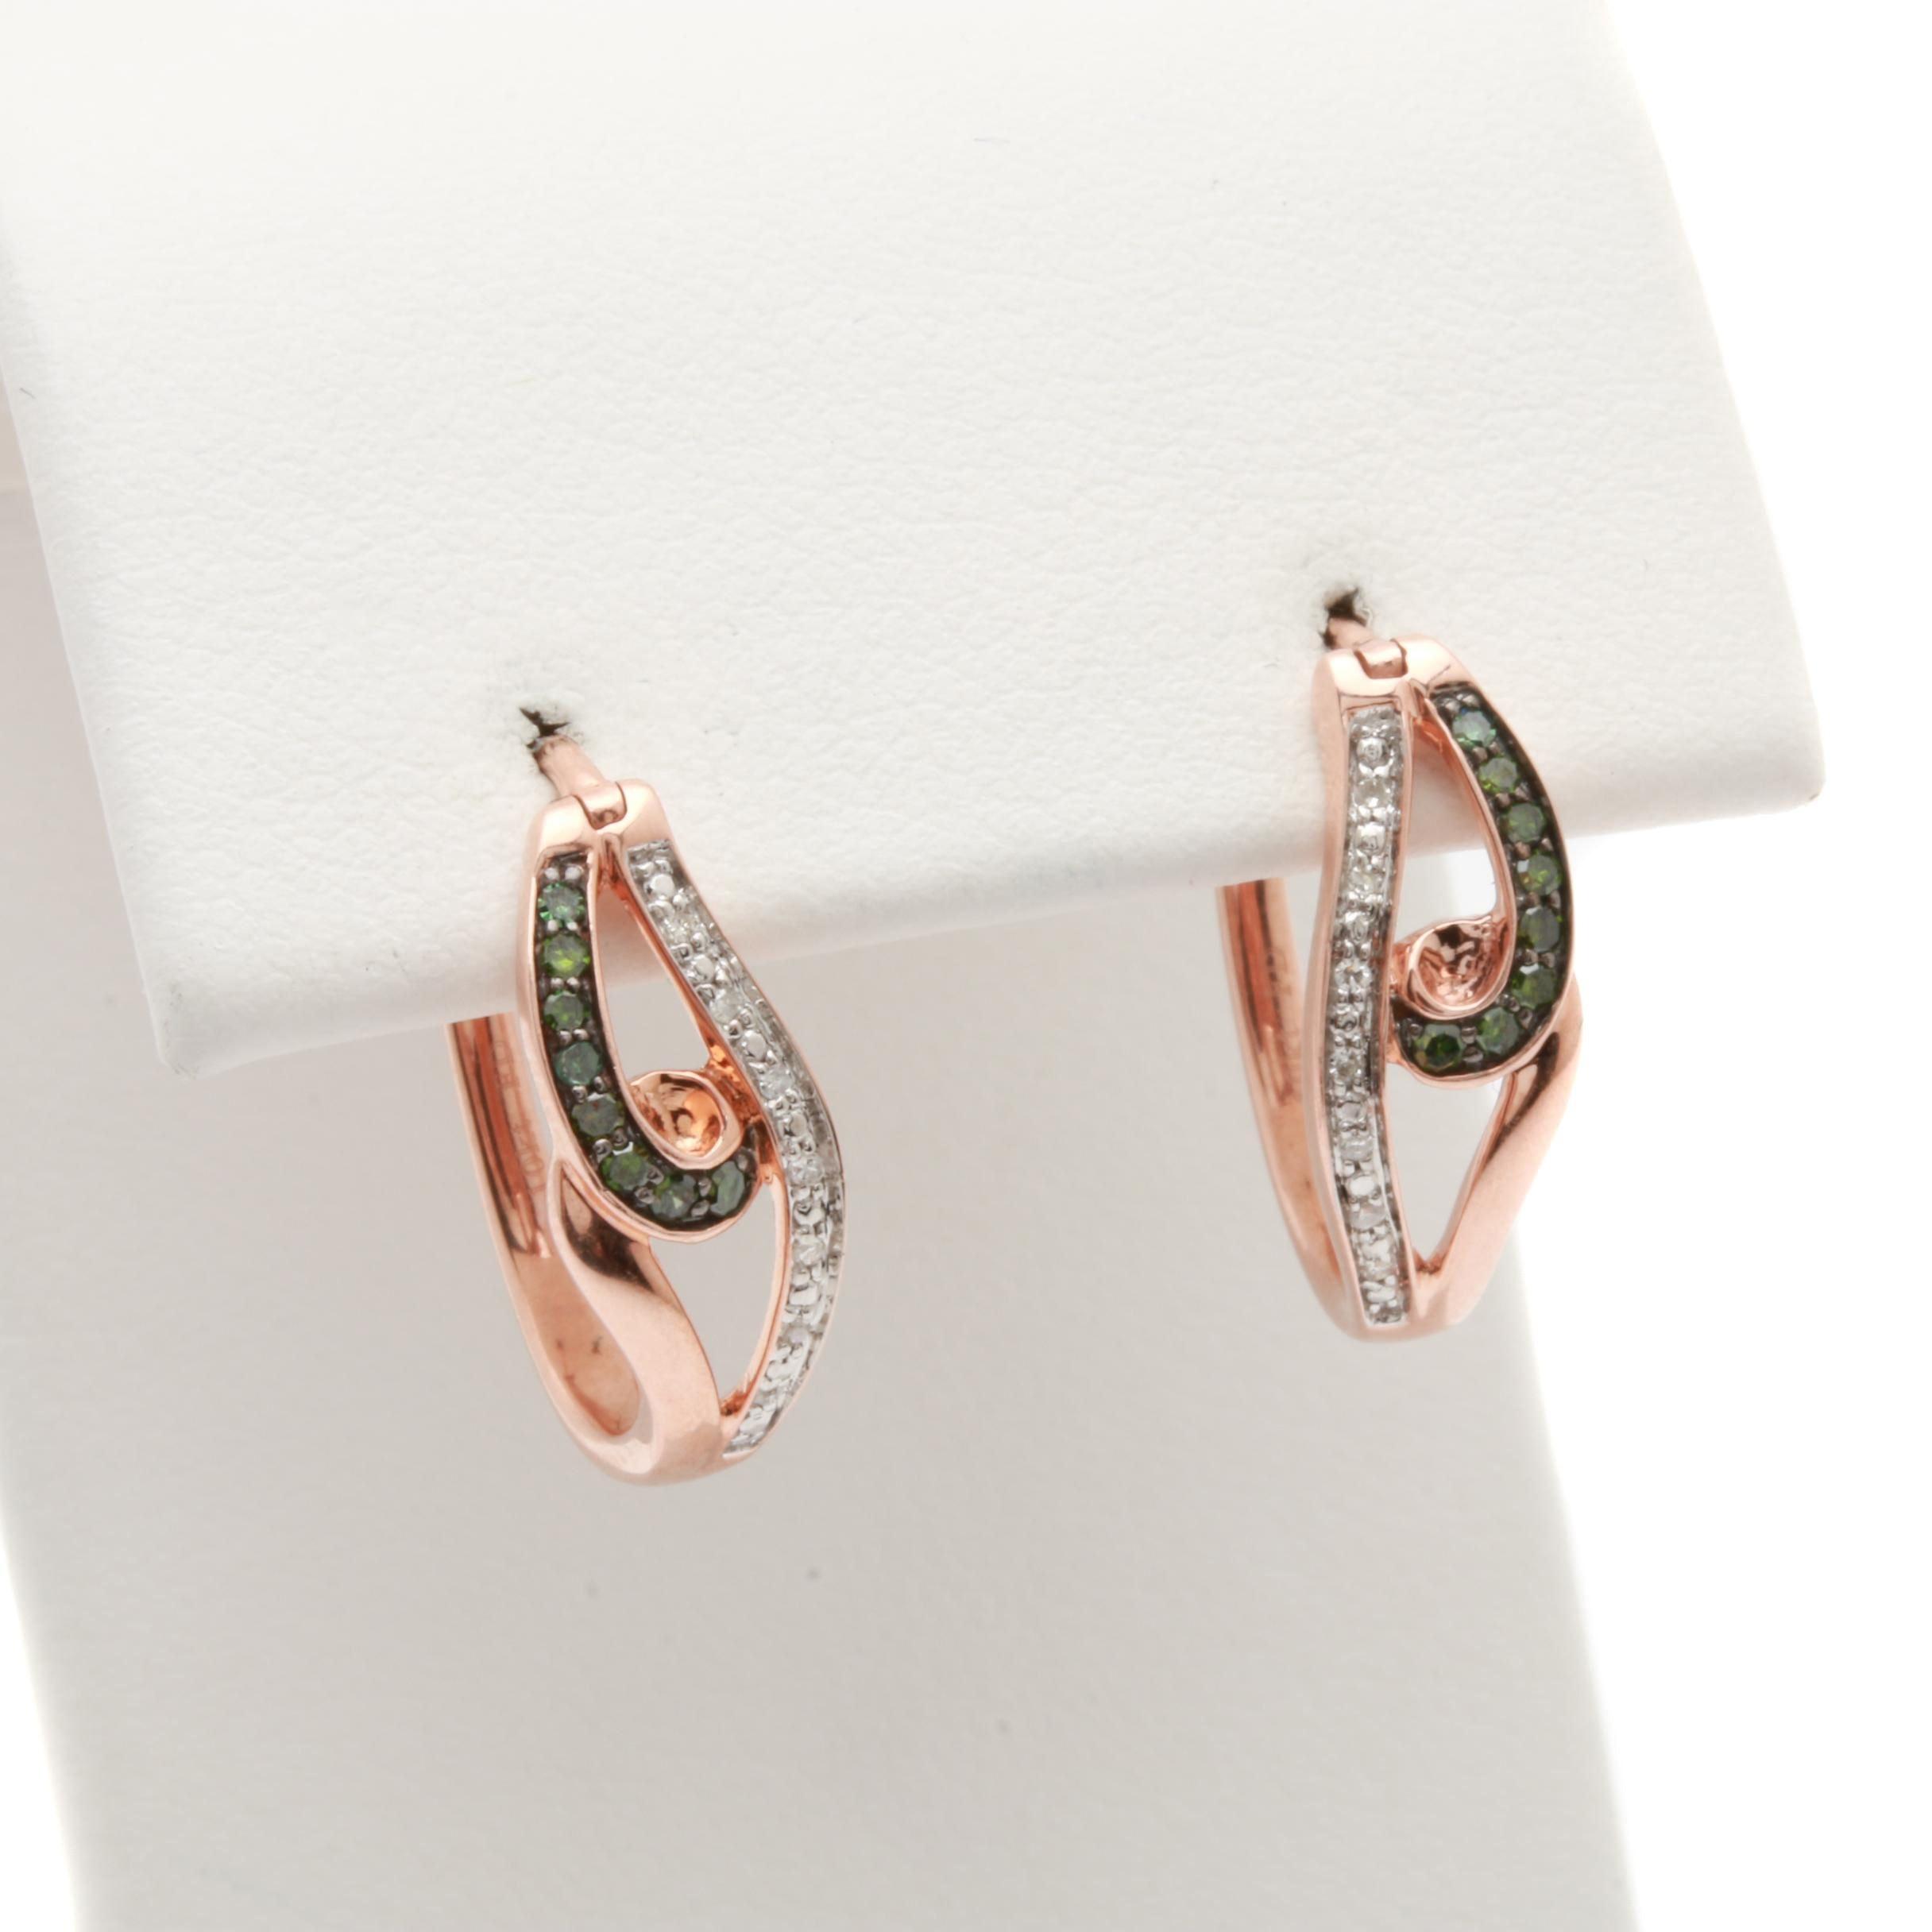 10K Rose Gold Diamond Hoop Earrings Including Green Diamonds